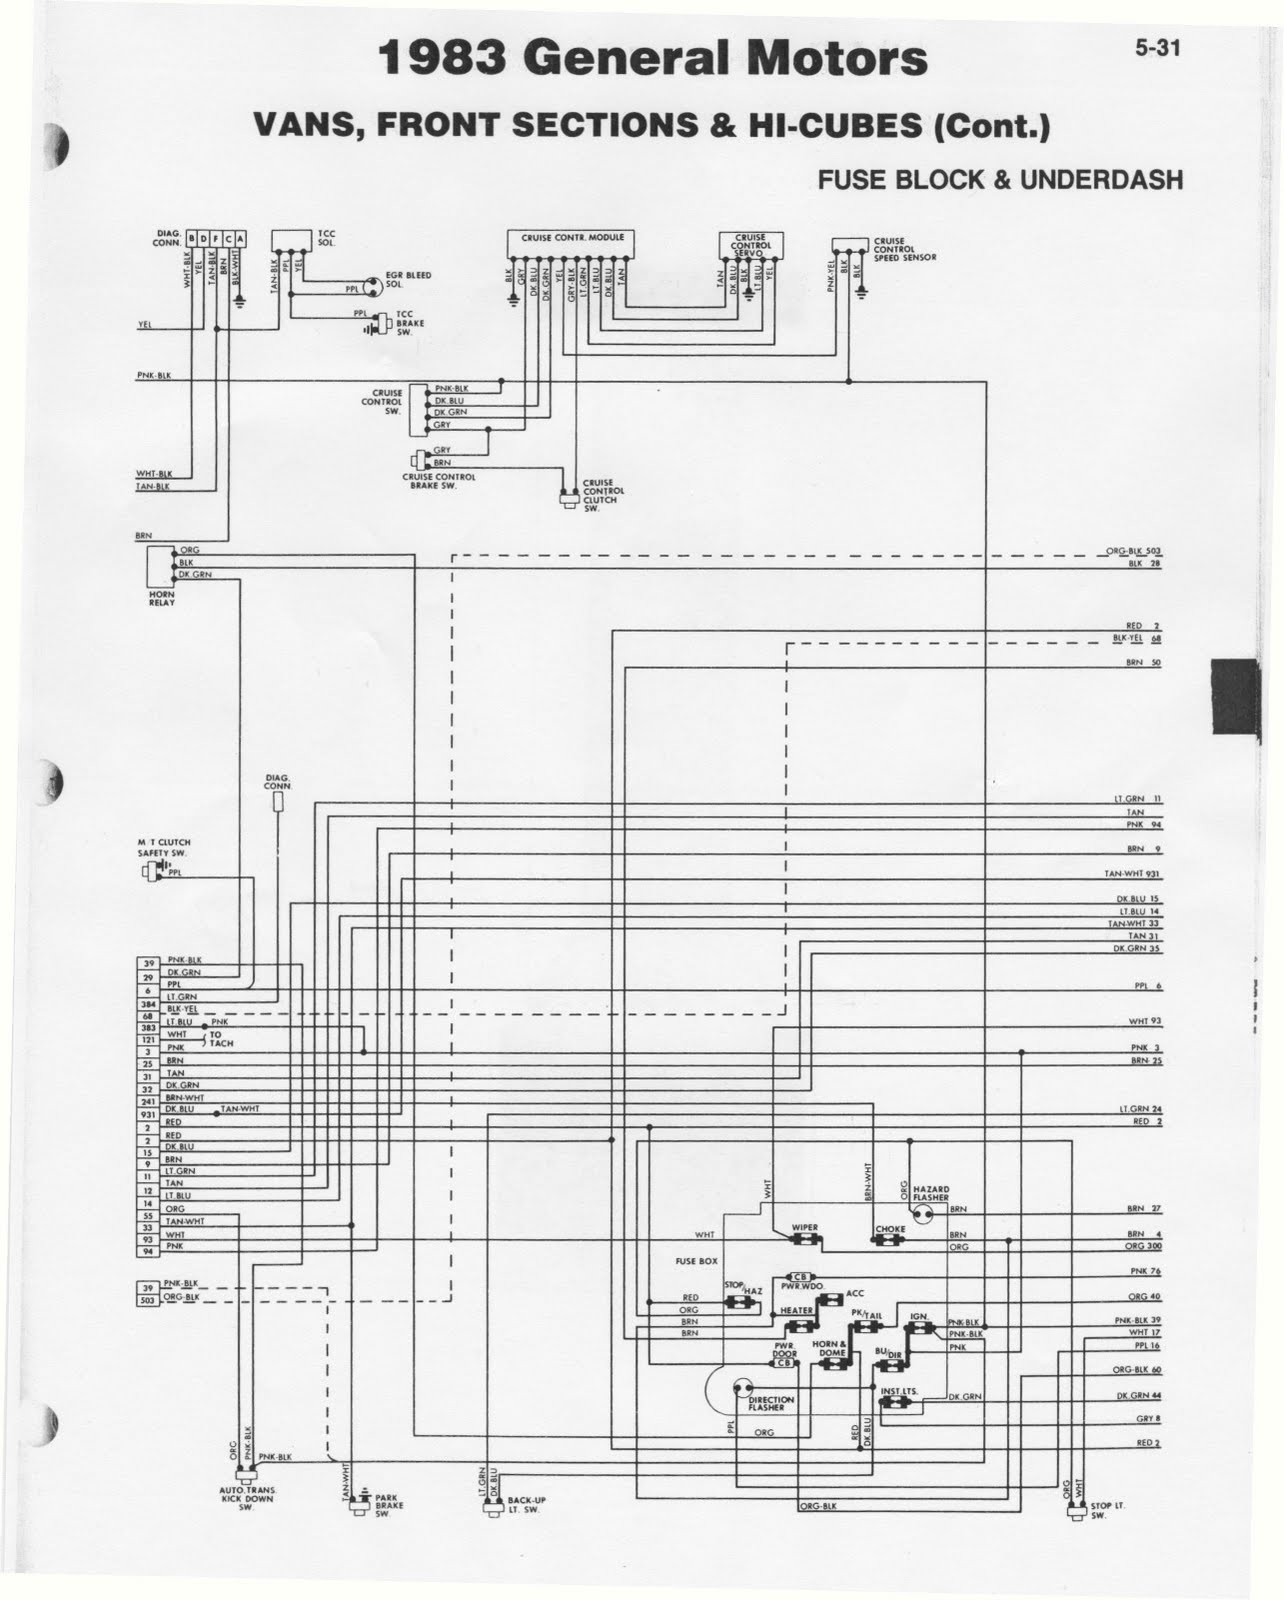 Plcm7200 Wiring Diagram